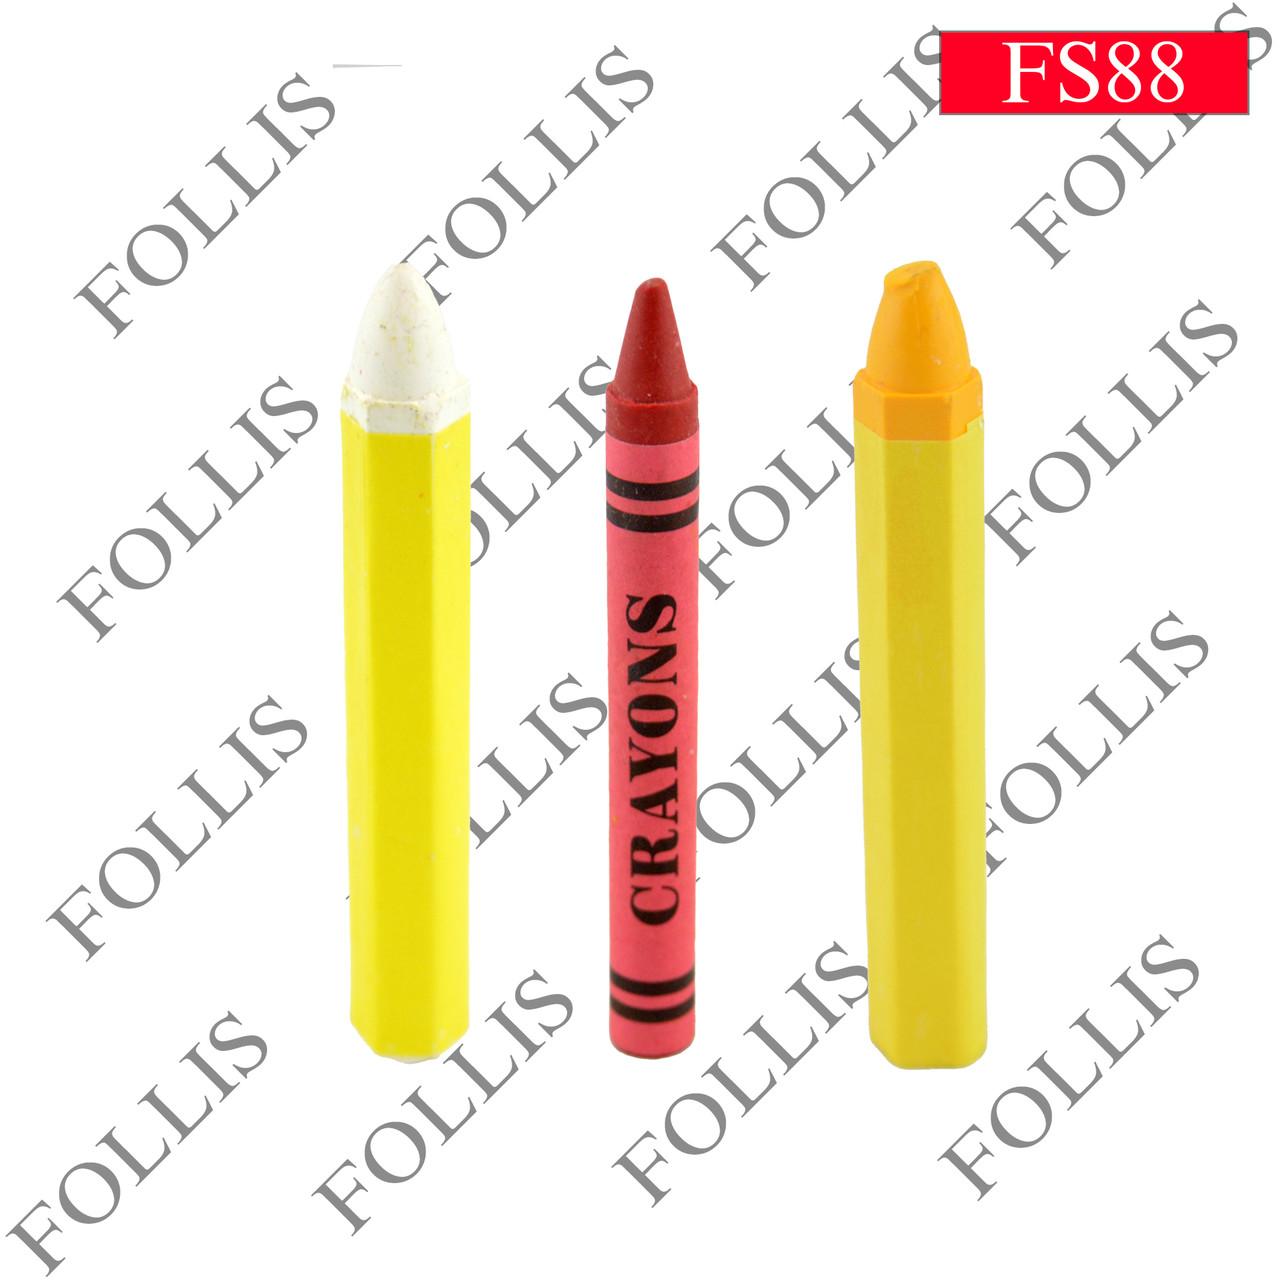 S-489 Crayon pen, Yellow/White/Orange color (Мель)